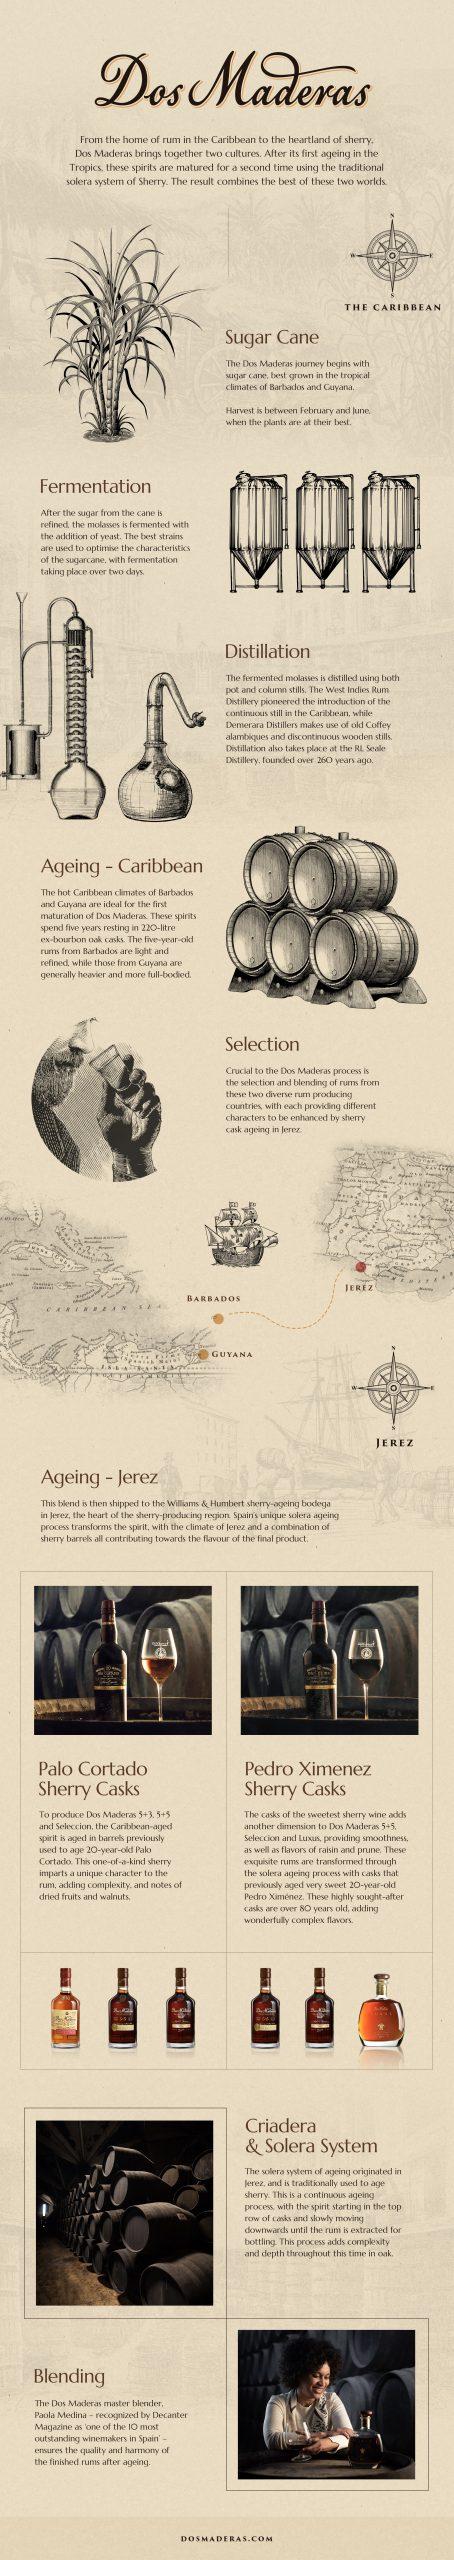 Dos Maderas Rum Infographic Digital Agency